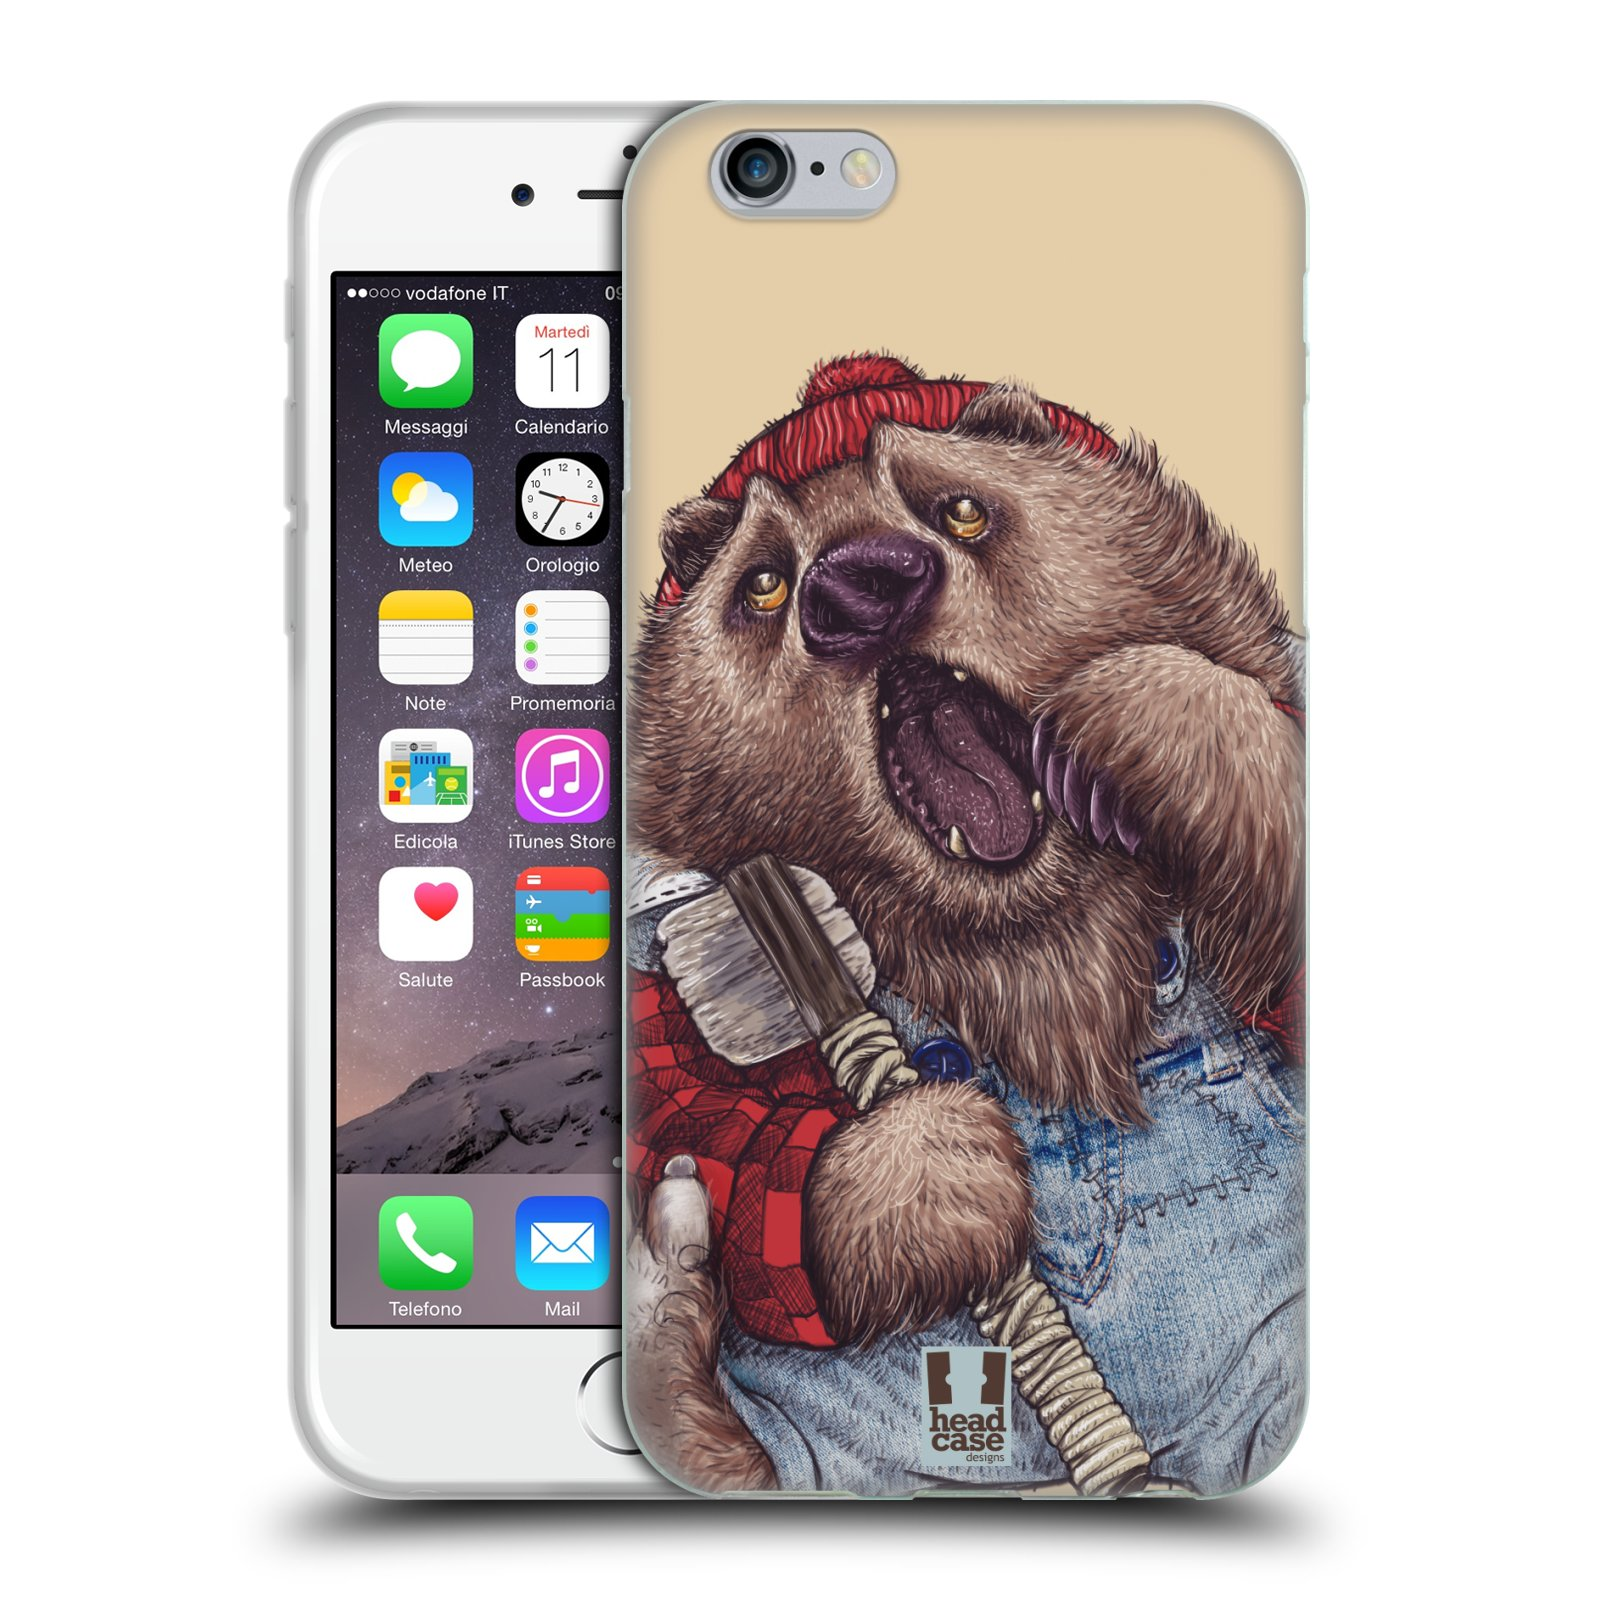 Silikonové pouzdro na mobil Apple iPhone 6 a 6S HEAD CASE ANIMPLA MEDVĚD